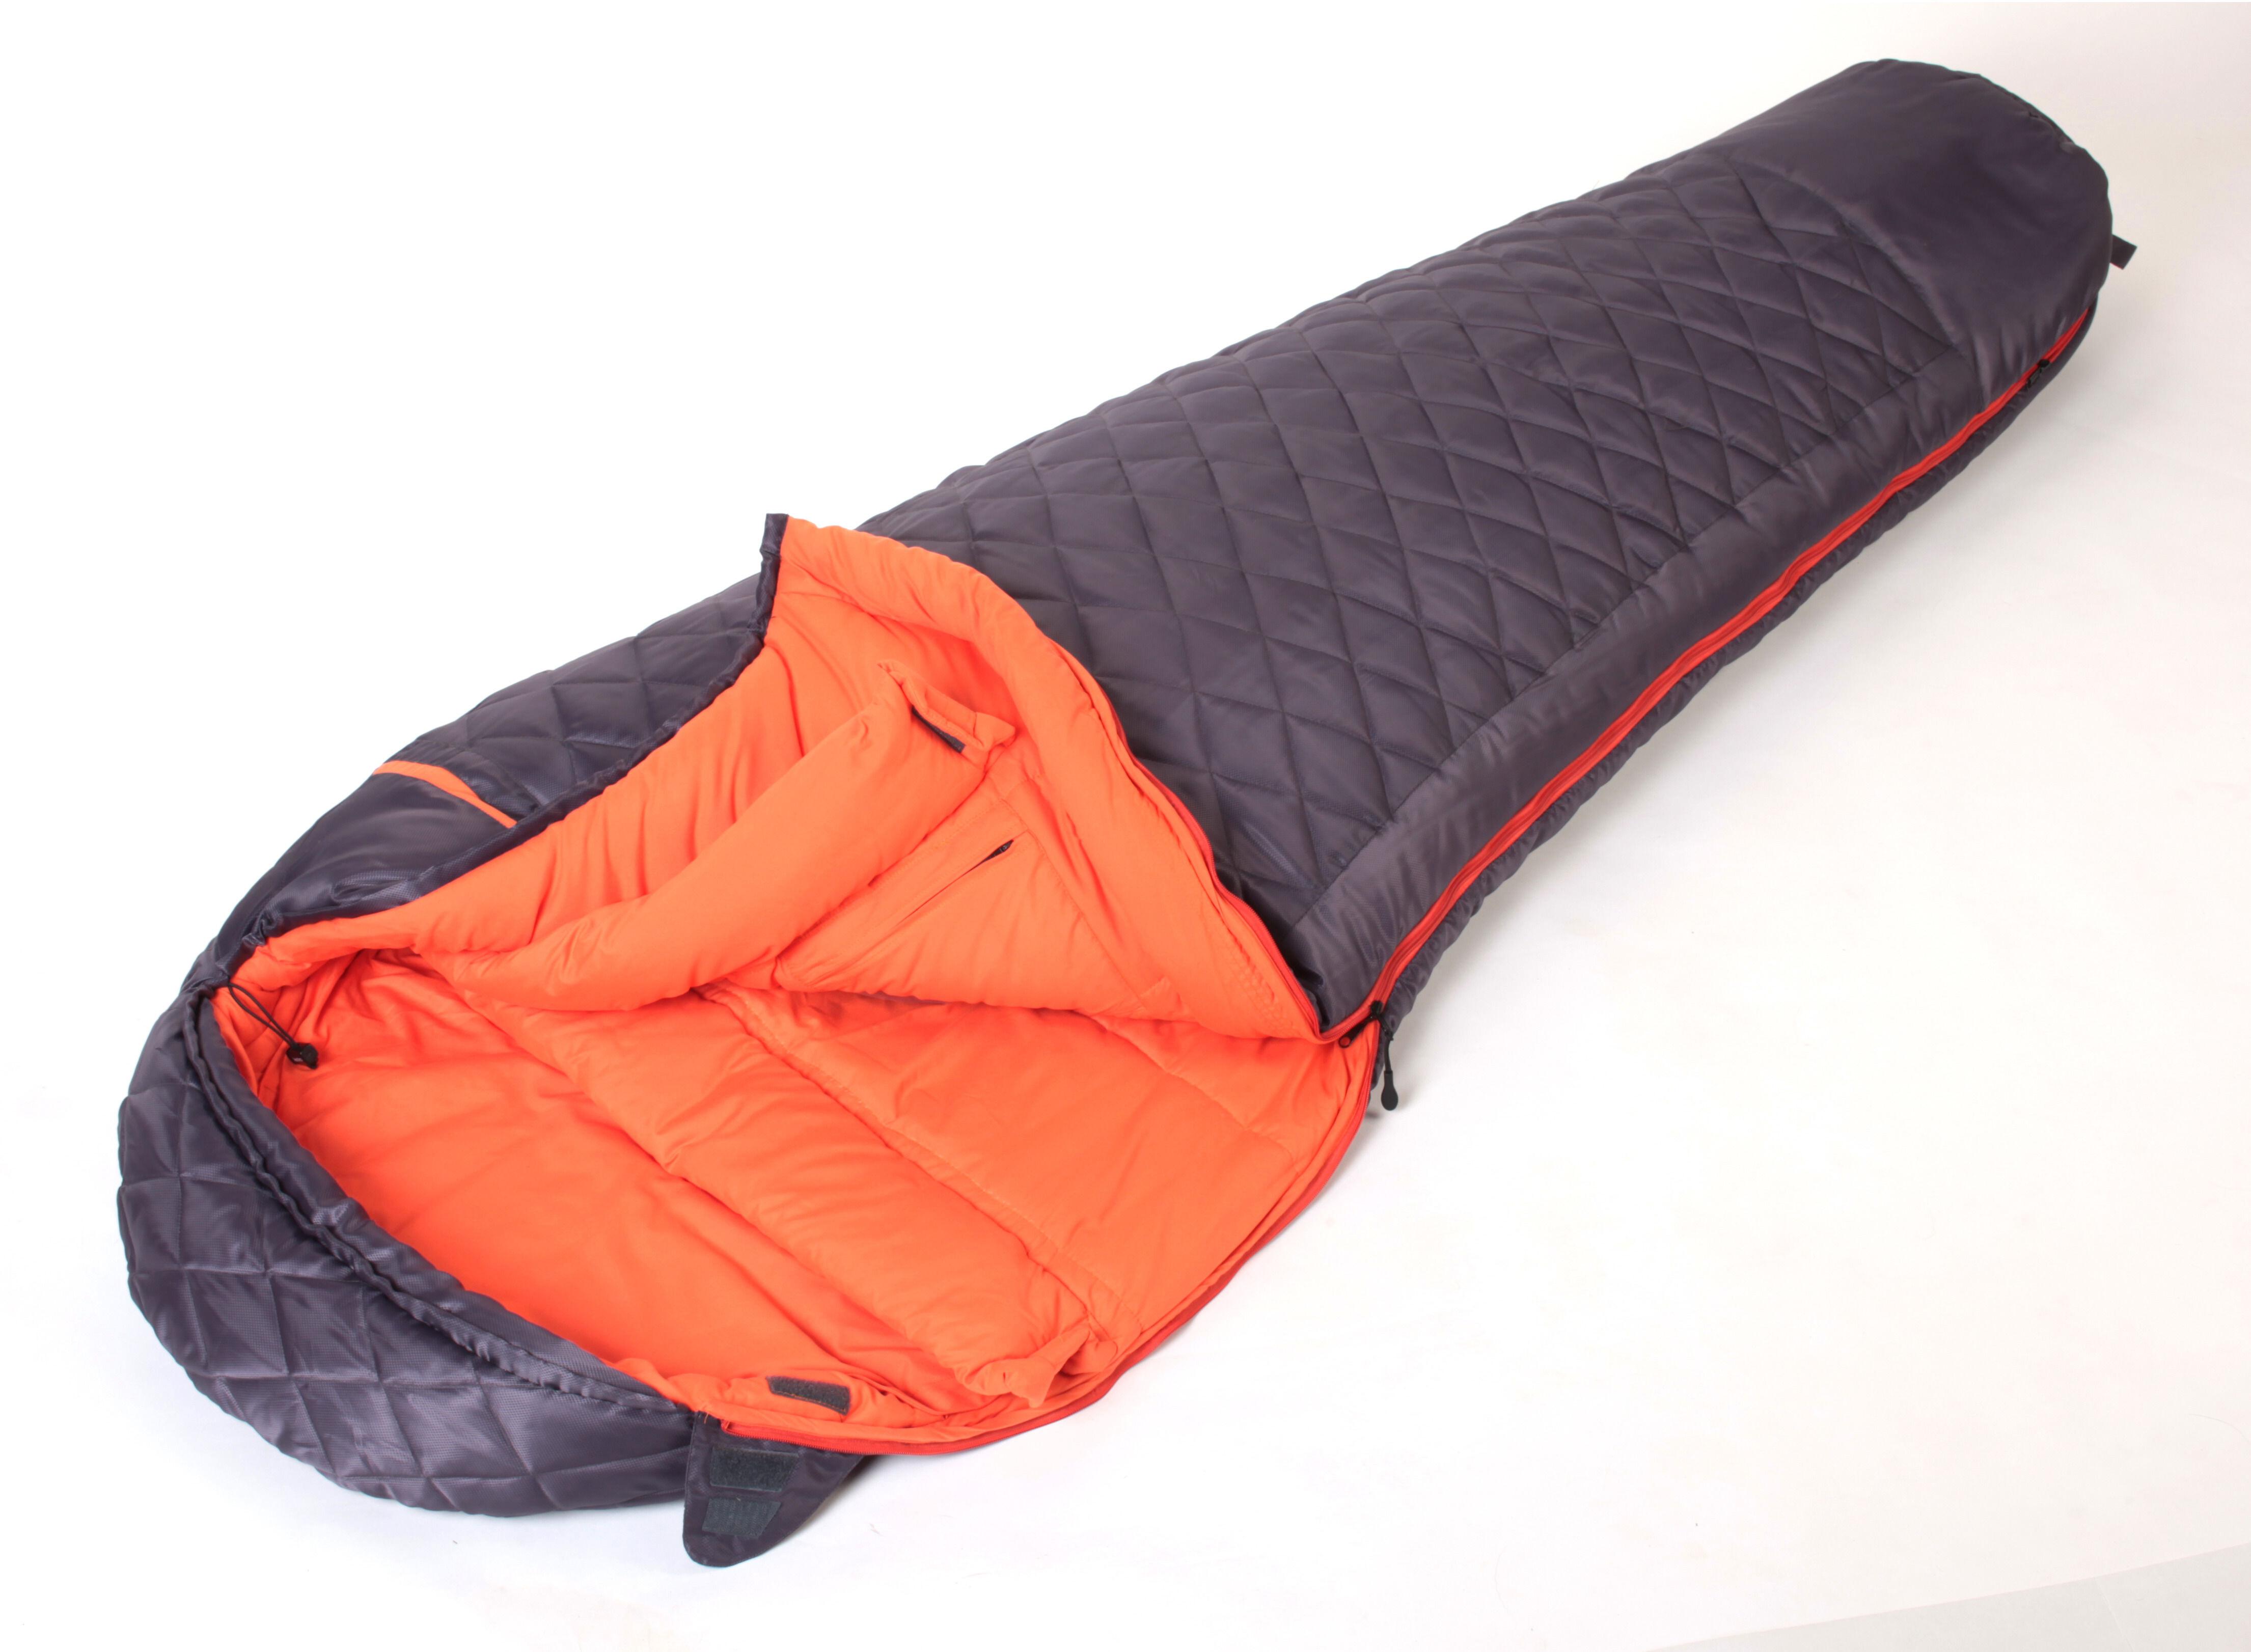 Mammut Klettergurt Everest Light : Lestra mount everest 230 schlafsack grau orange campz.de